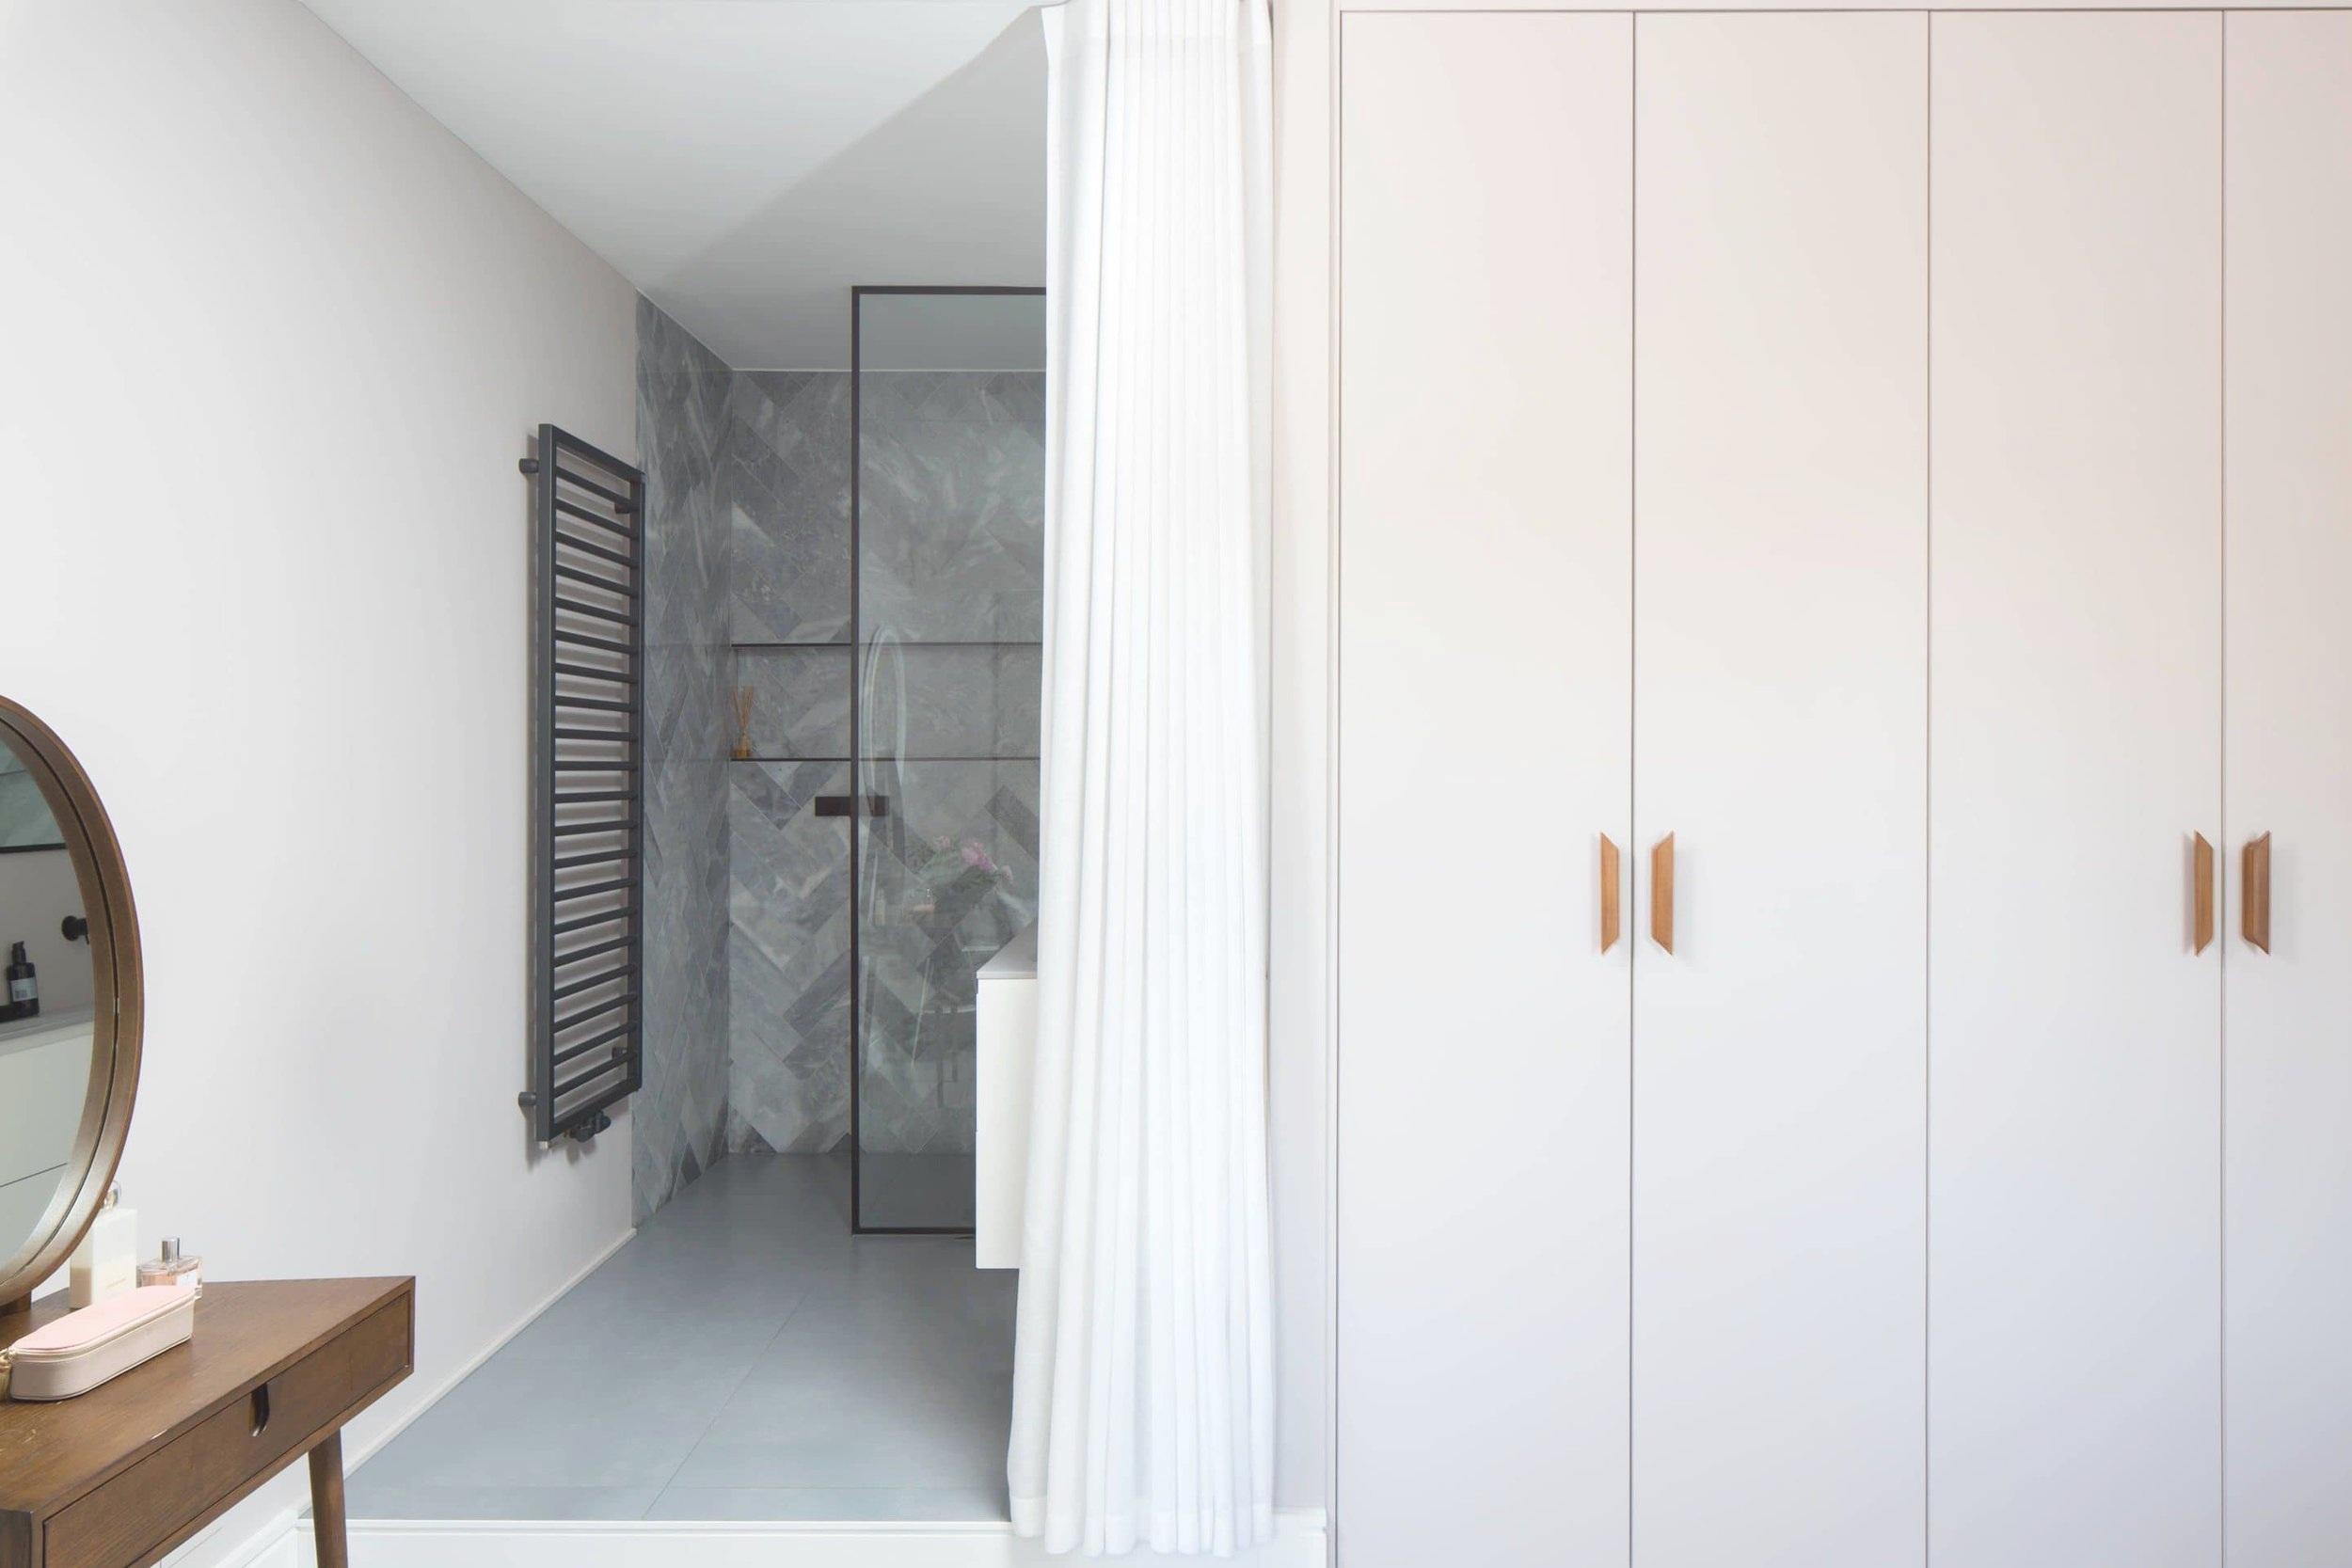 Fulham-Master-Bedroom-Suite-Refurbishment-London-9.jpg